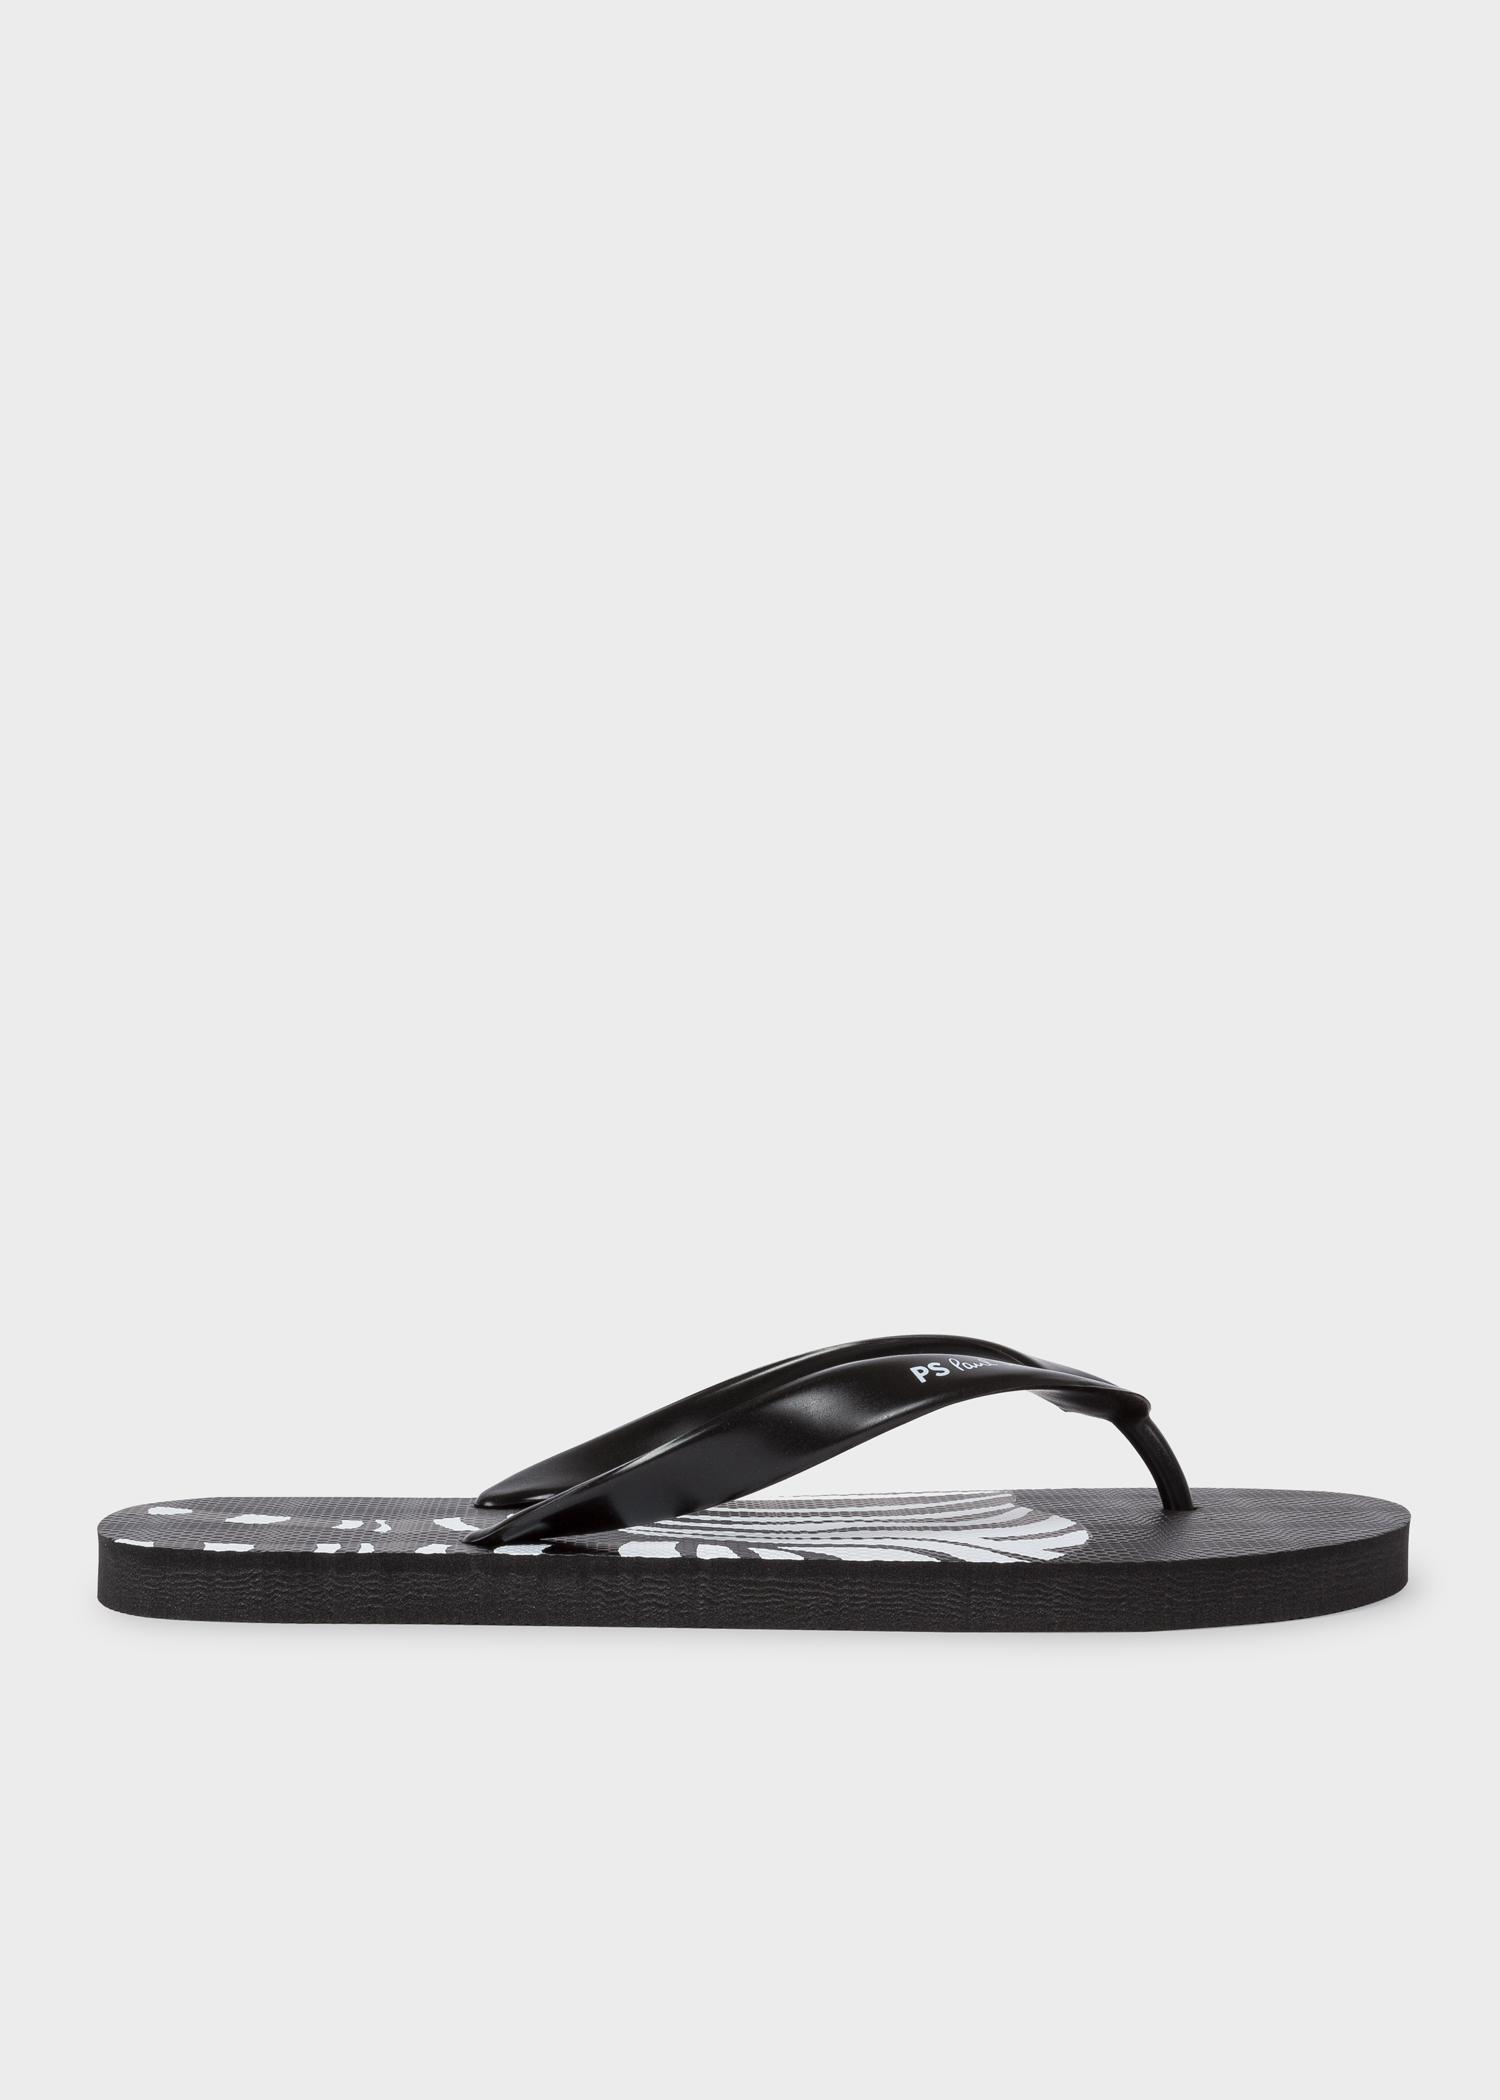 9518c4ad9b5932 Men s Black  Zebra  Print  Disc  Flip Flops - Paul Smith Asia